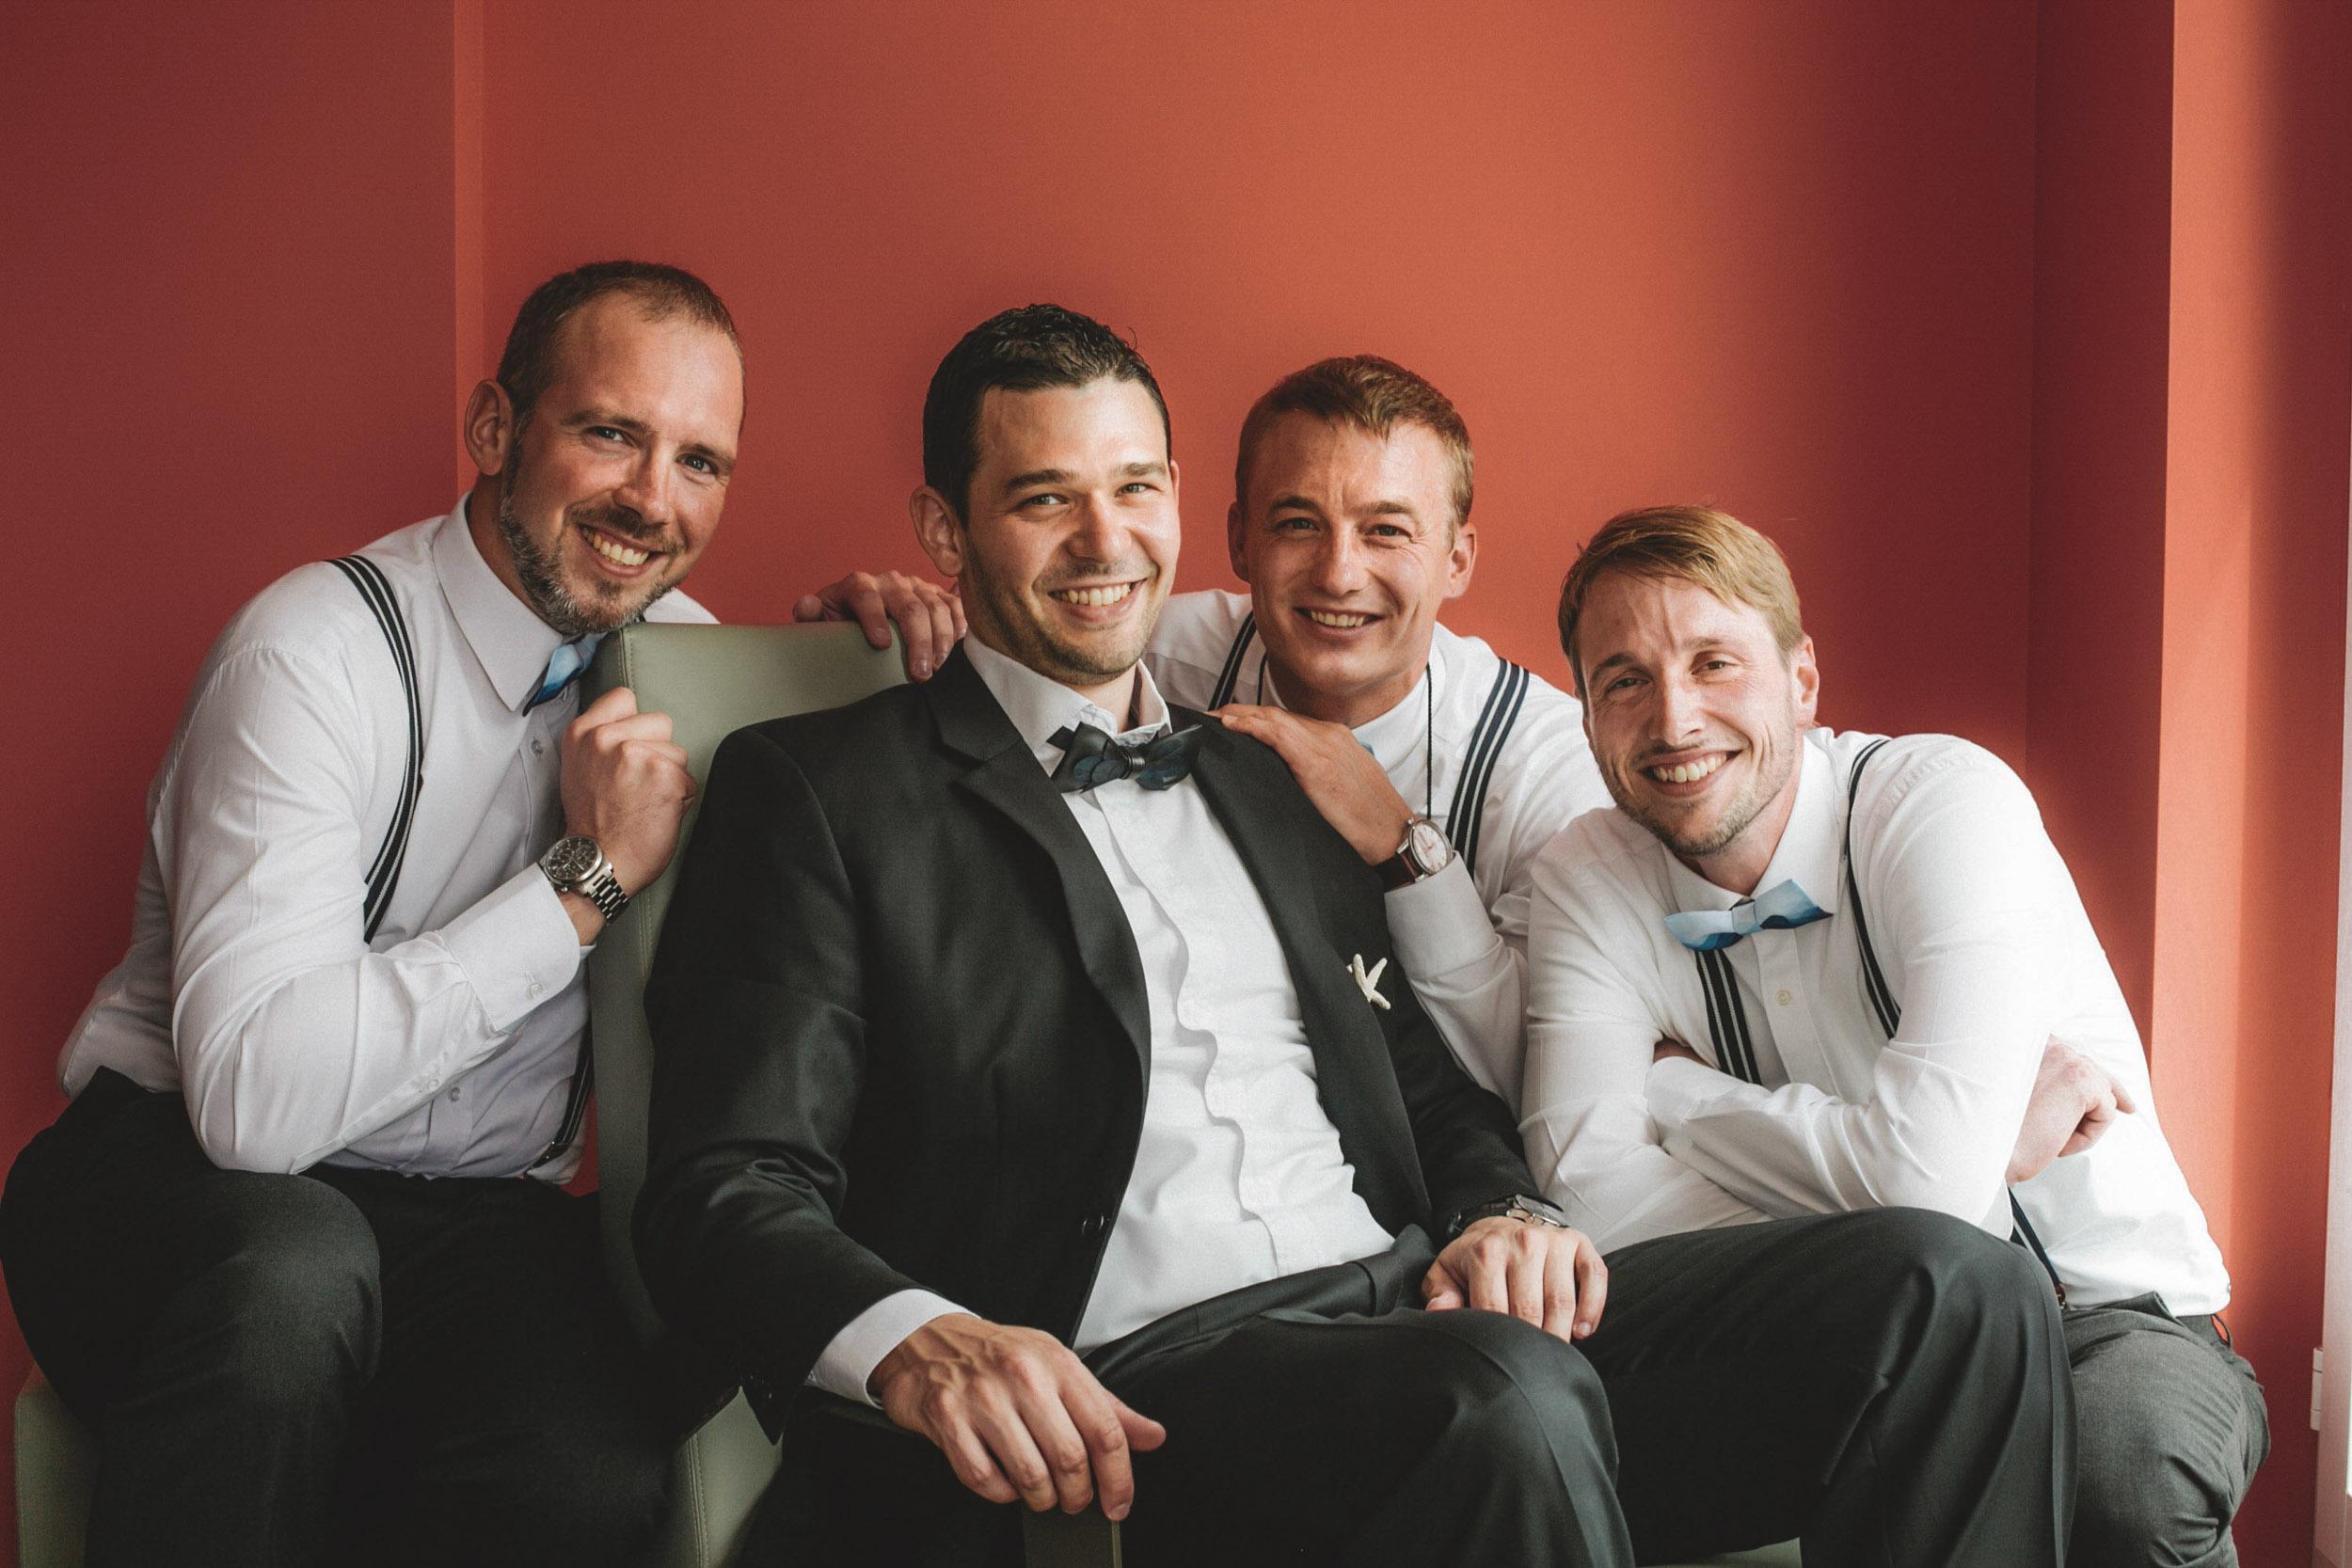 hochzeitsfotografie-schweiz_wedding-photographer-switzerland-europe_Bendik-Photography-096